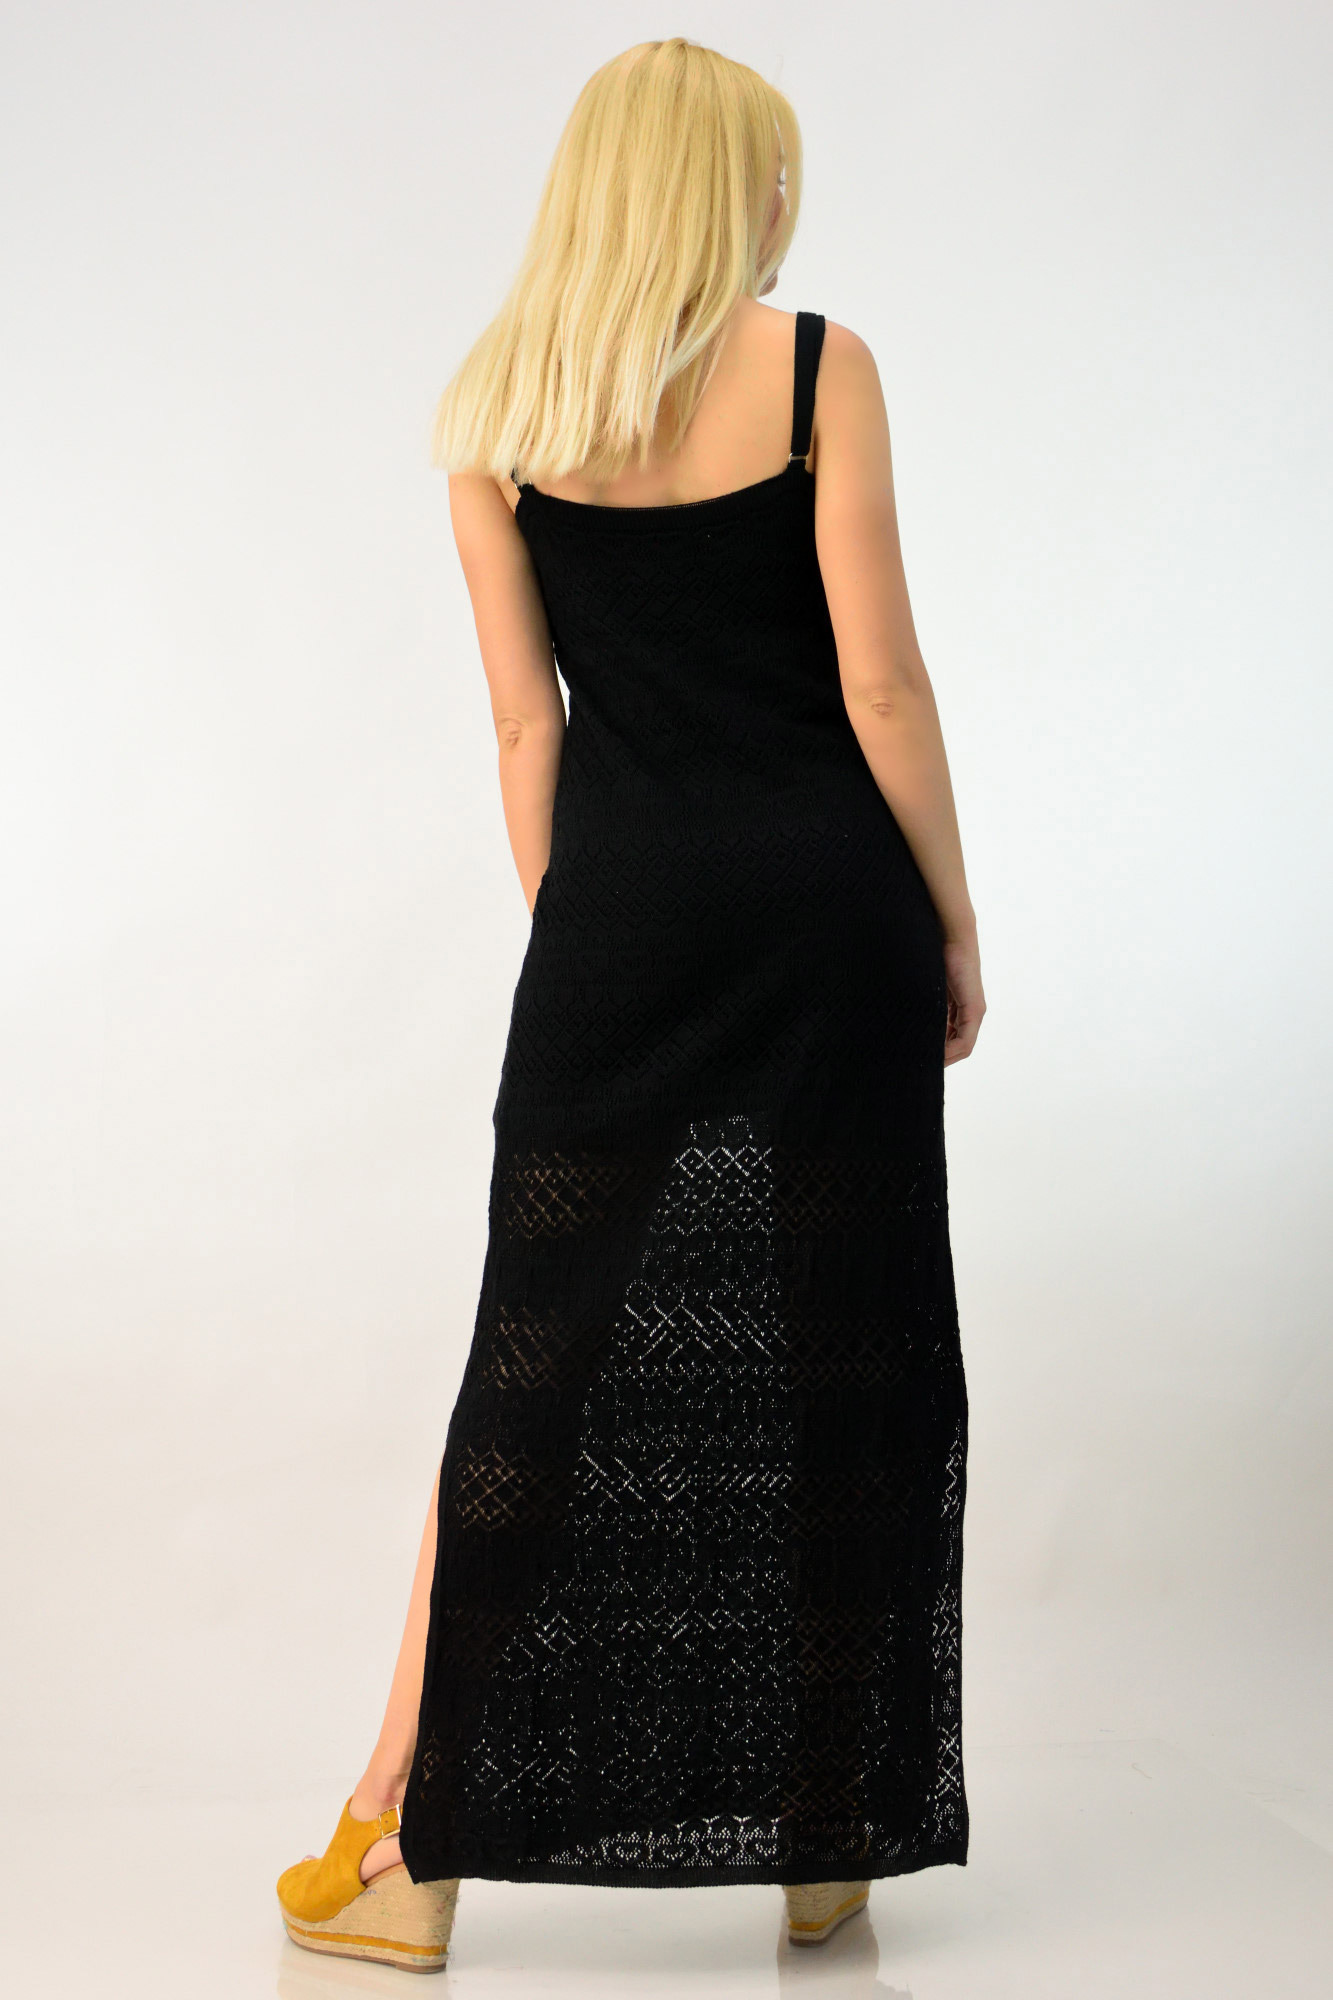 049f2f0ccbd Πλεκτό φόρεμα | Βραδινά Φορέματα | POTRE